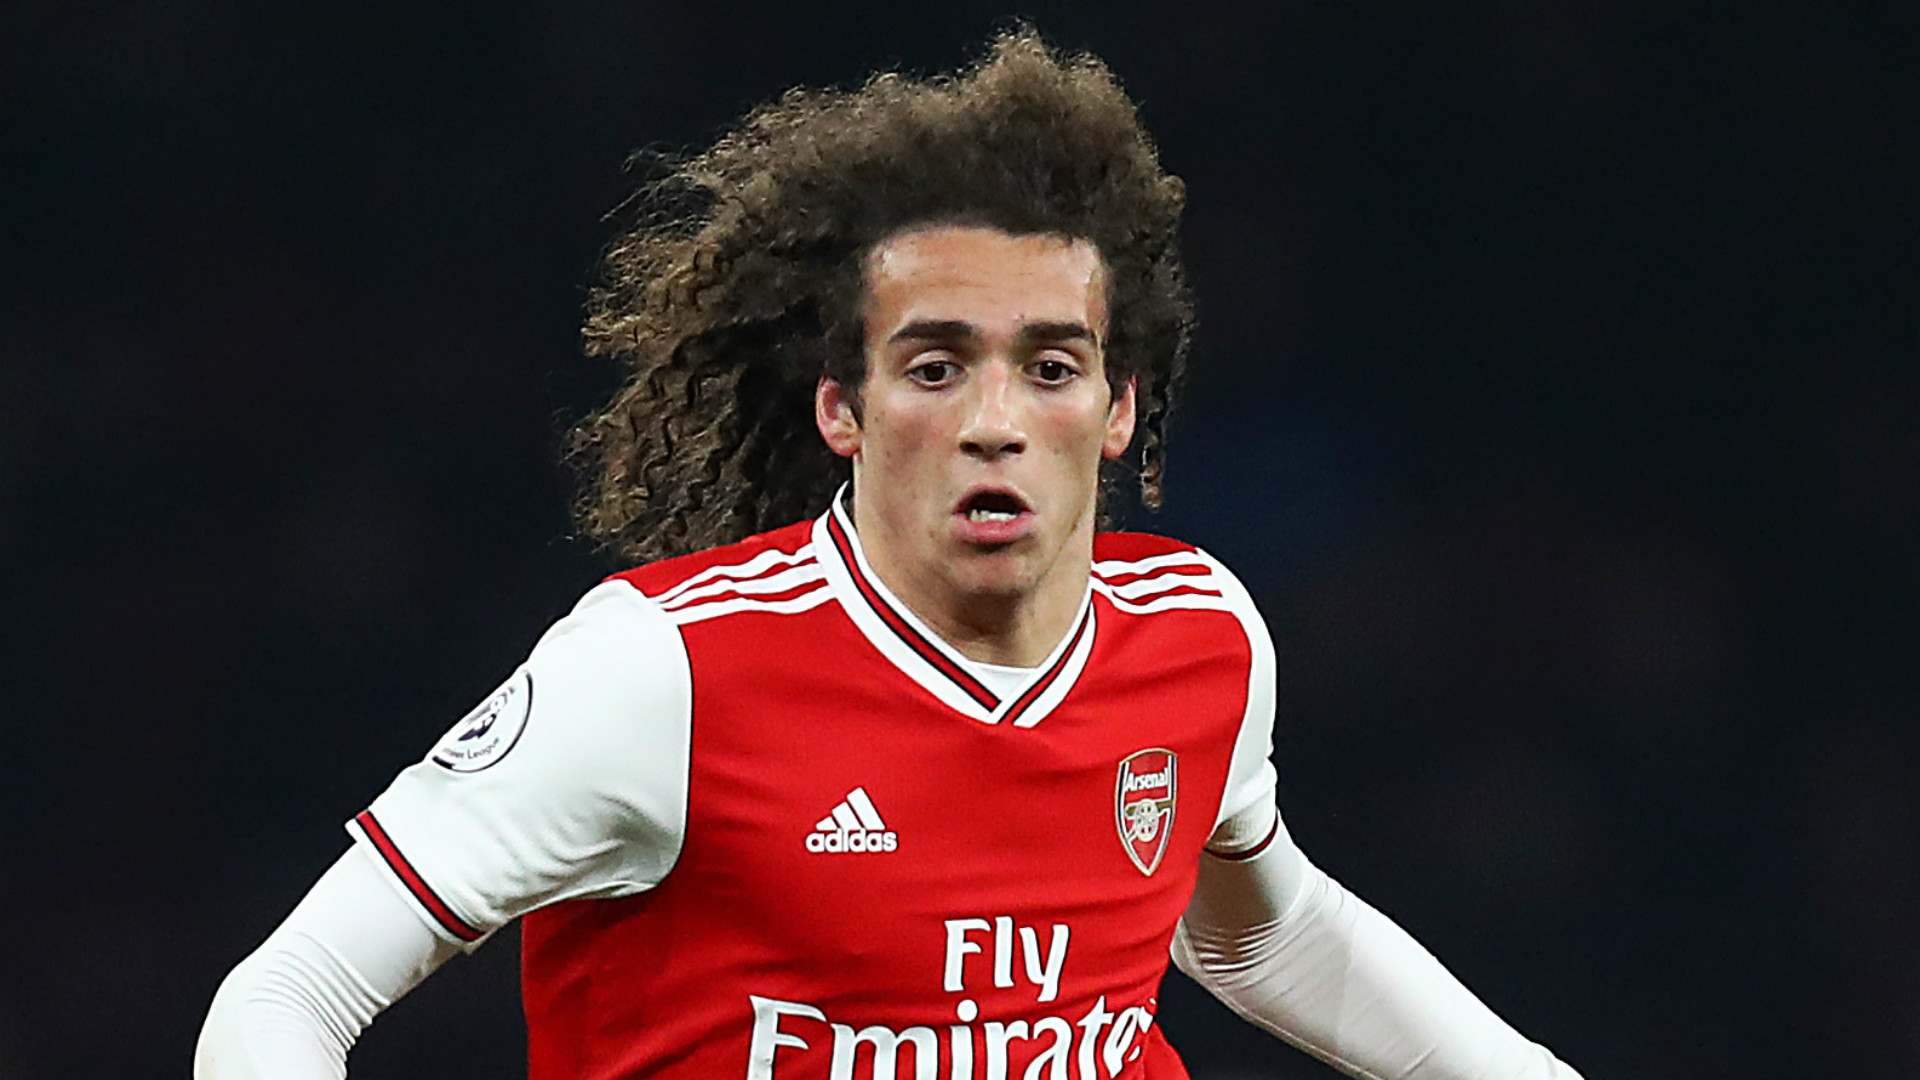 Arsenal loanee Guendouzi tests positive for coronavirus